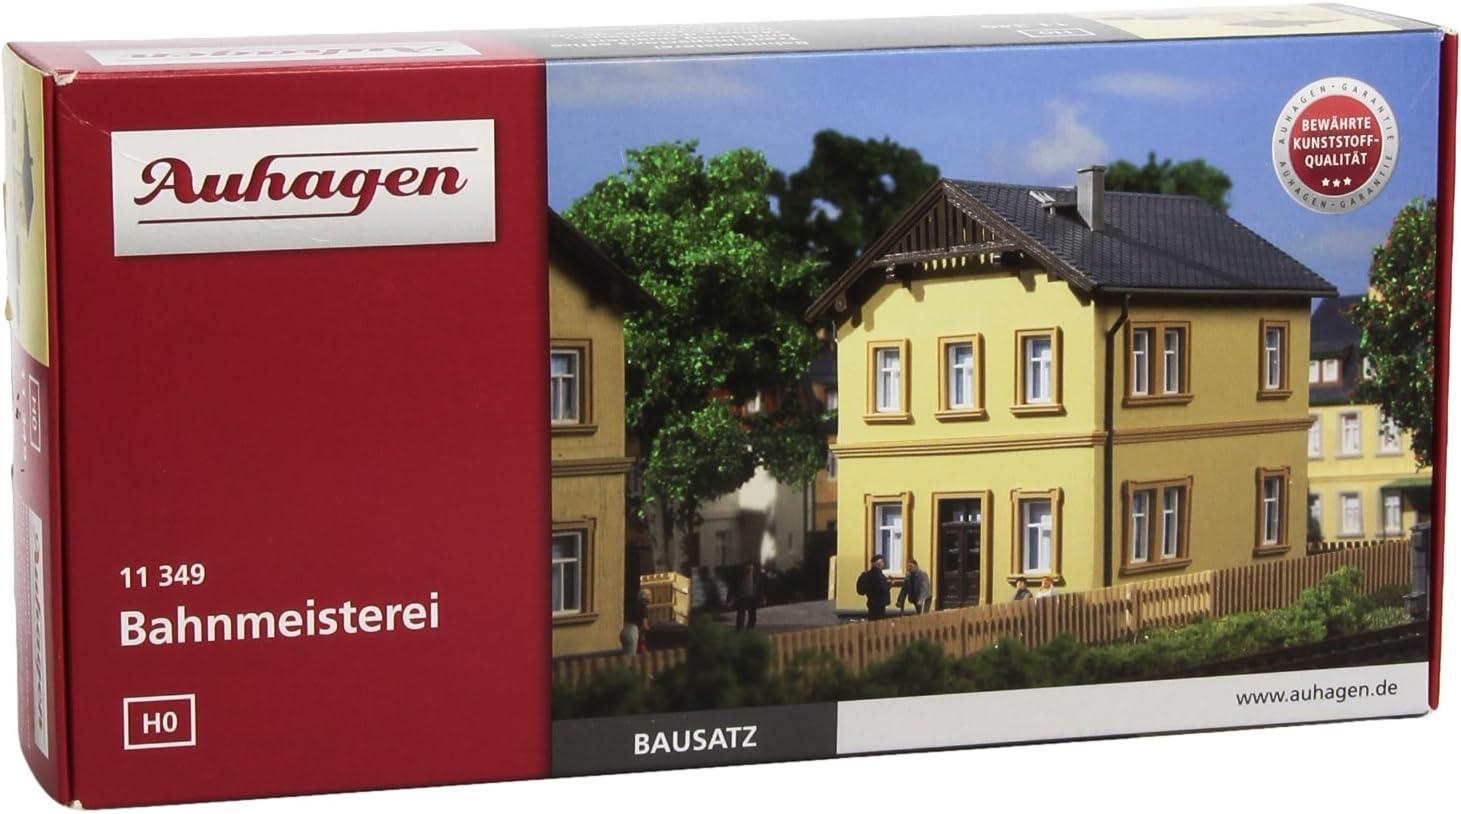 Auhagen kit 11349 NEW HO TRACK INSPECTORS HOUSE